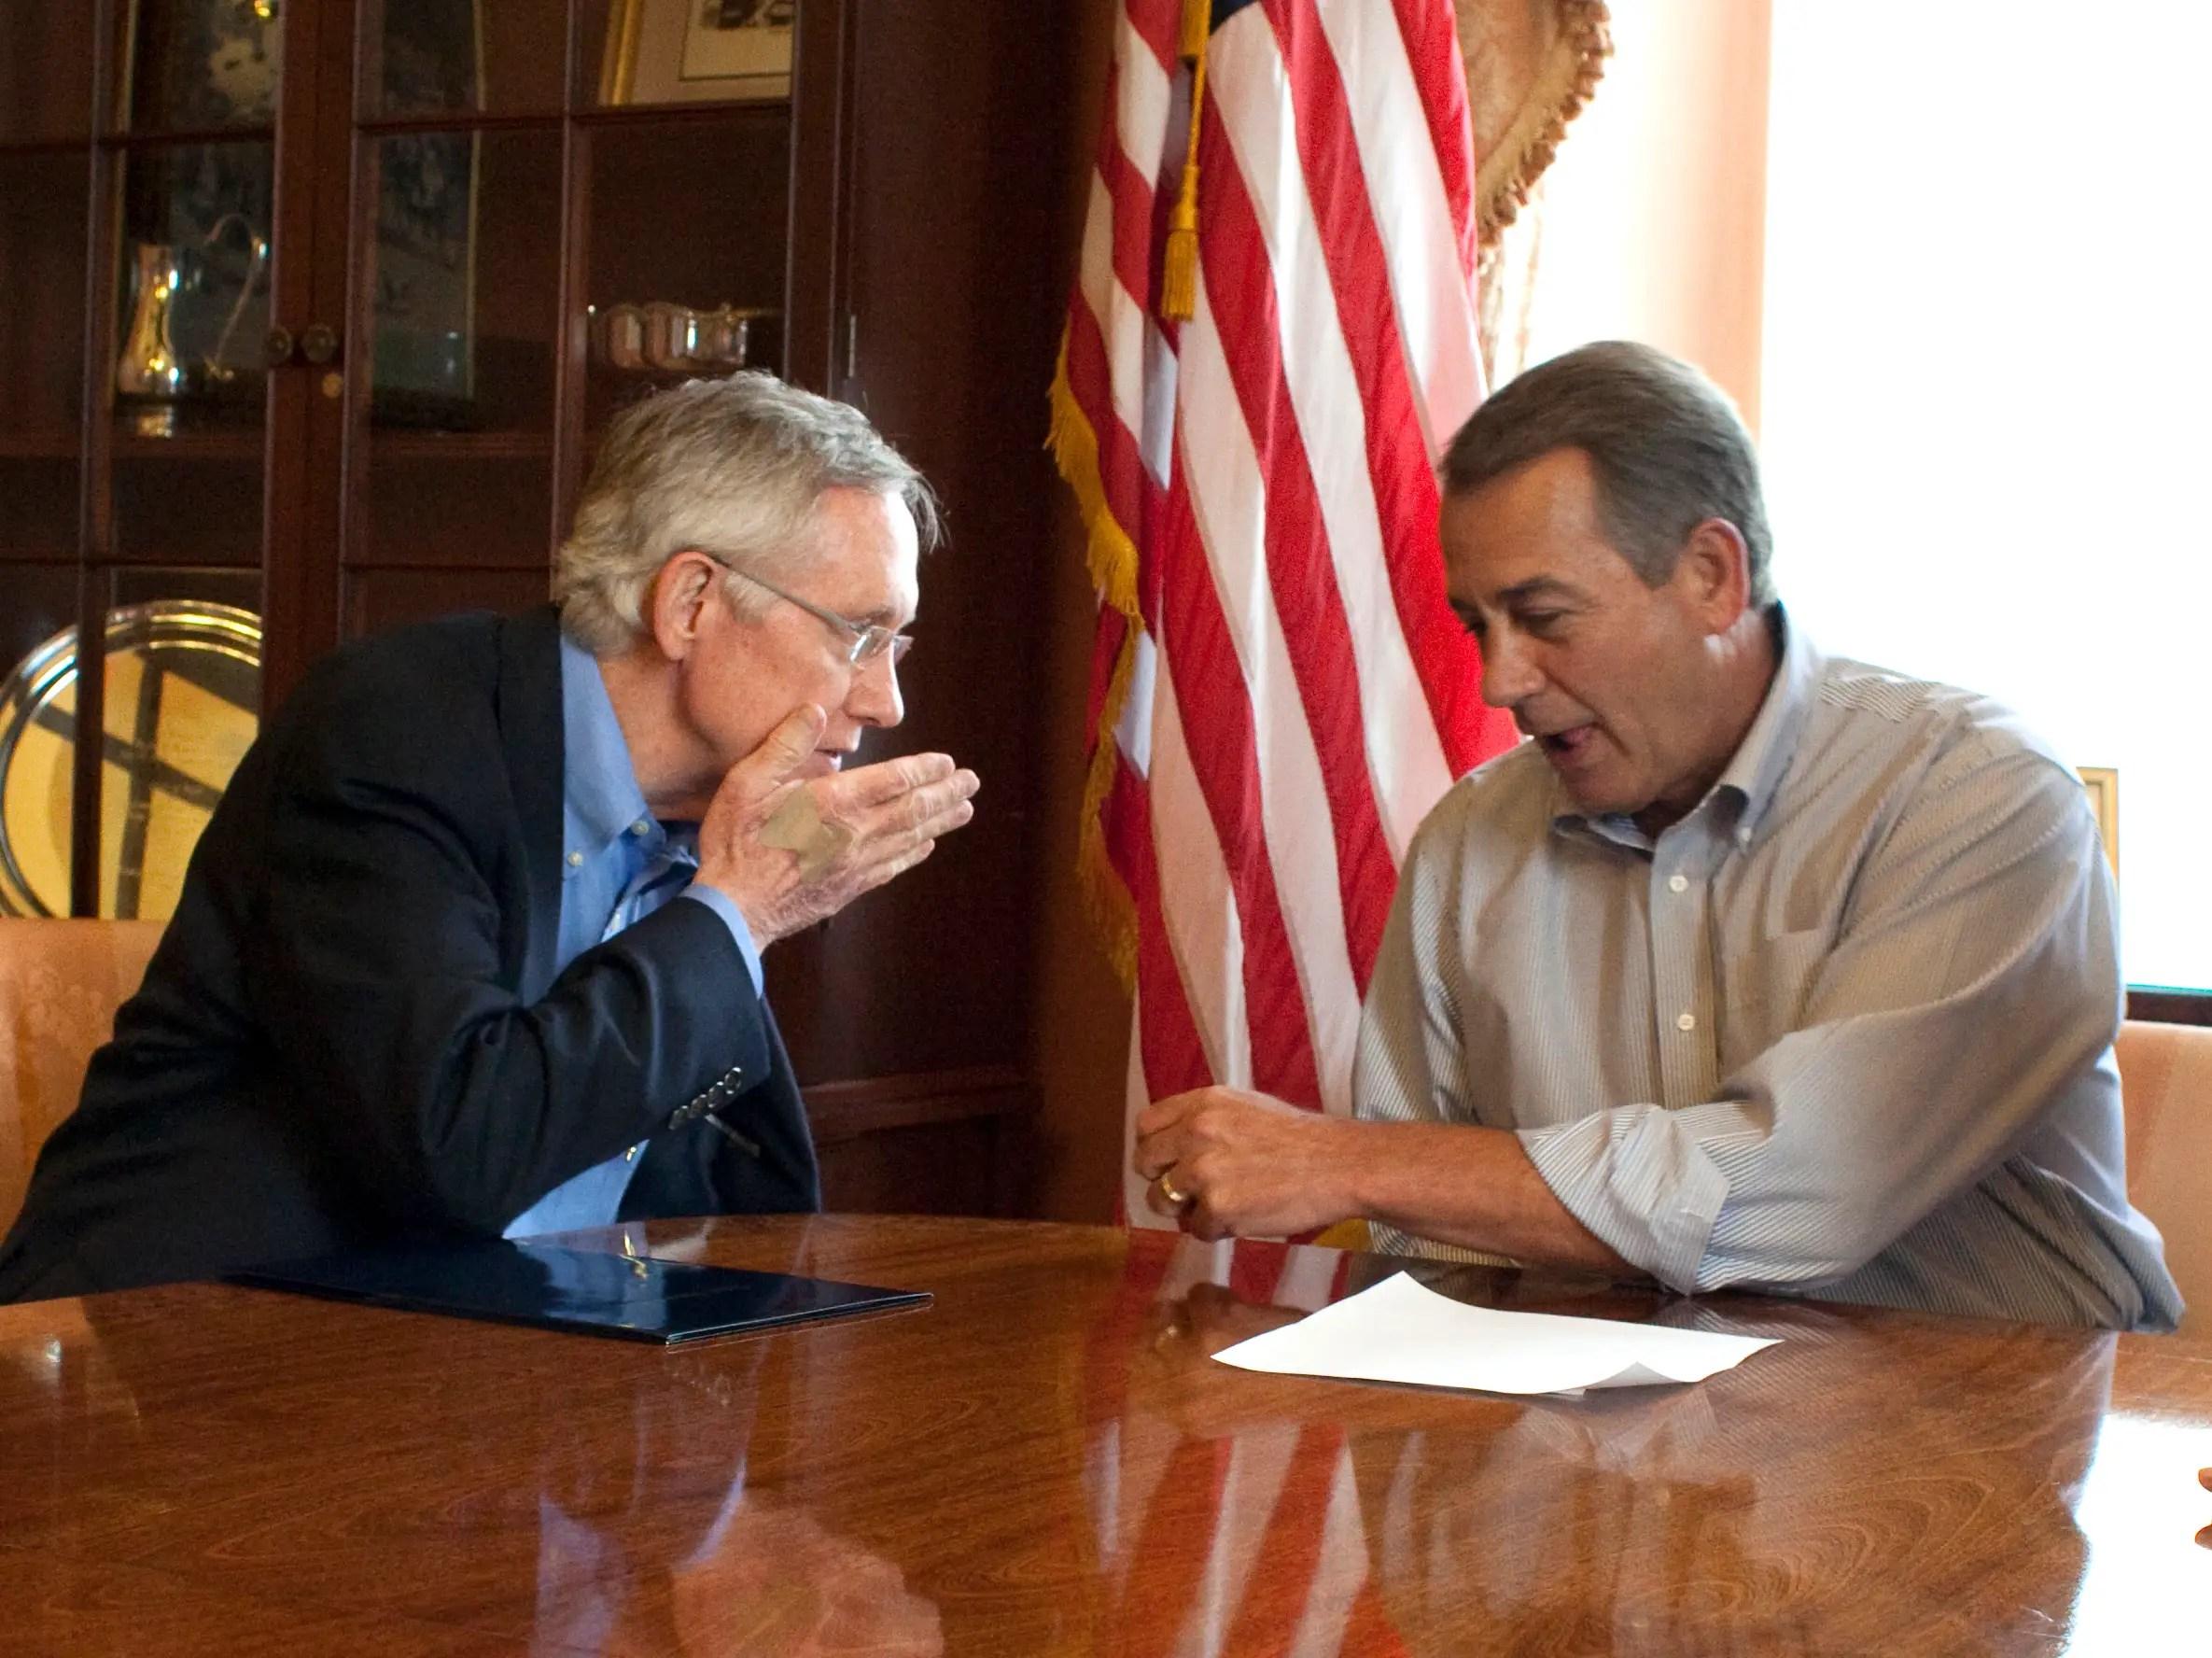 Reid, Boehner